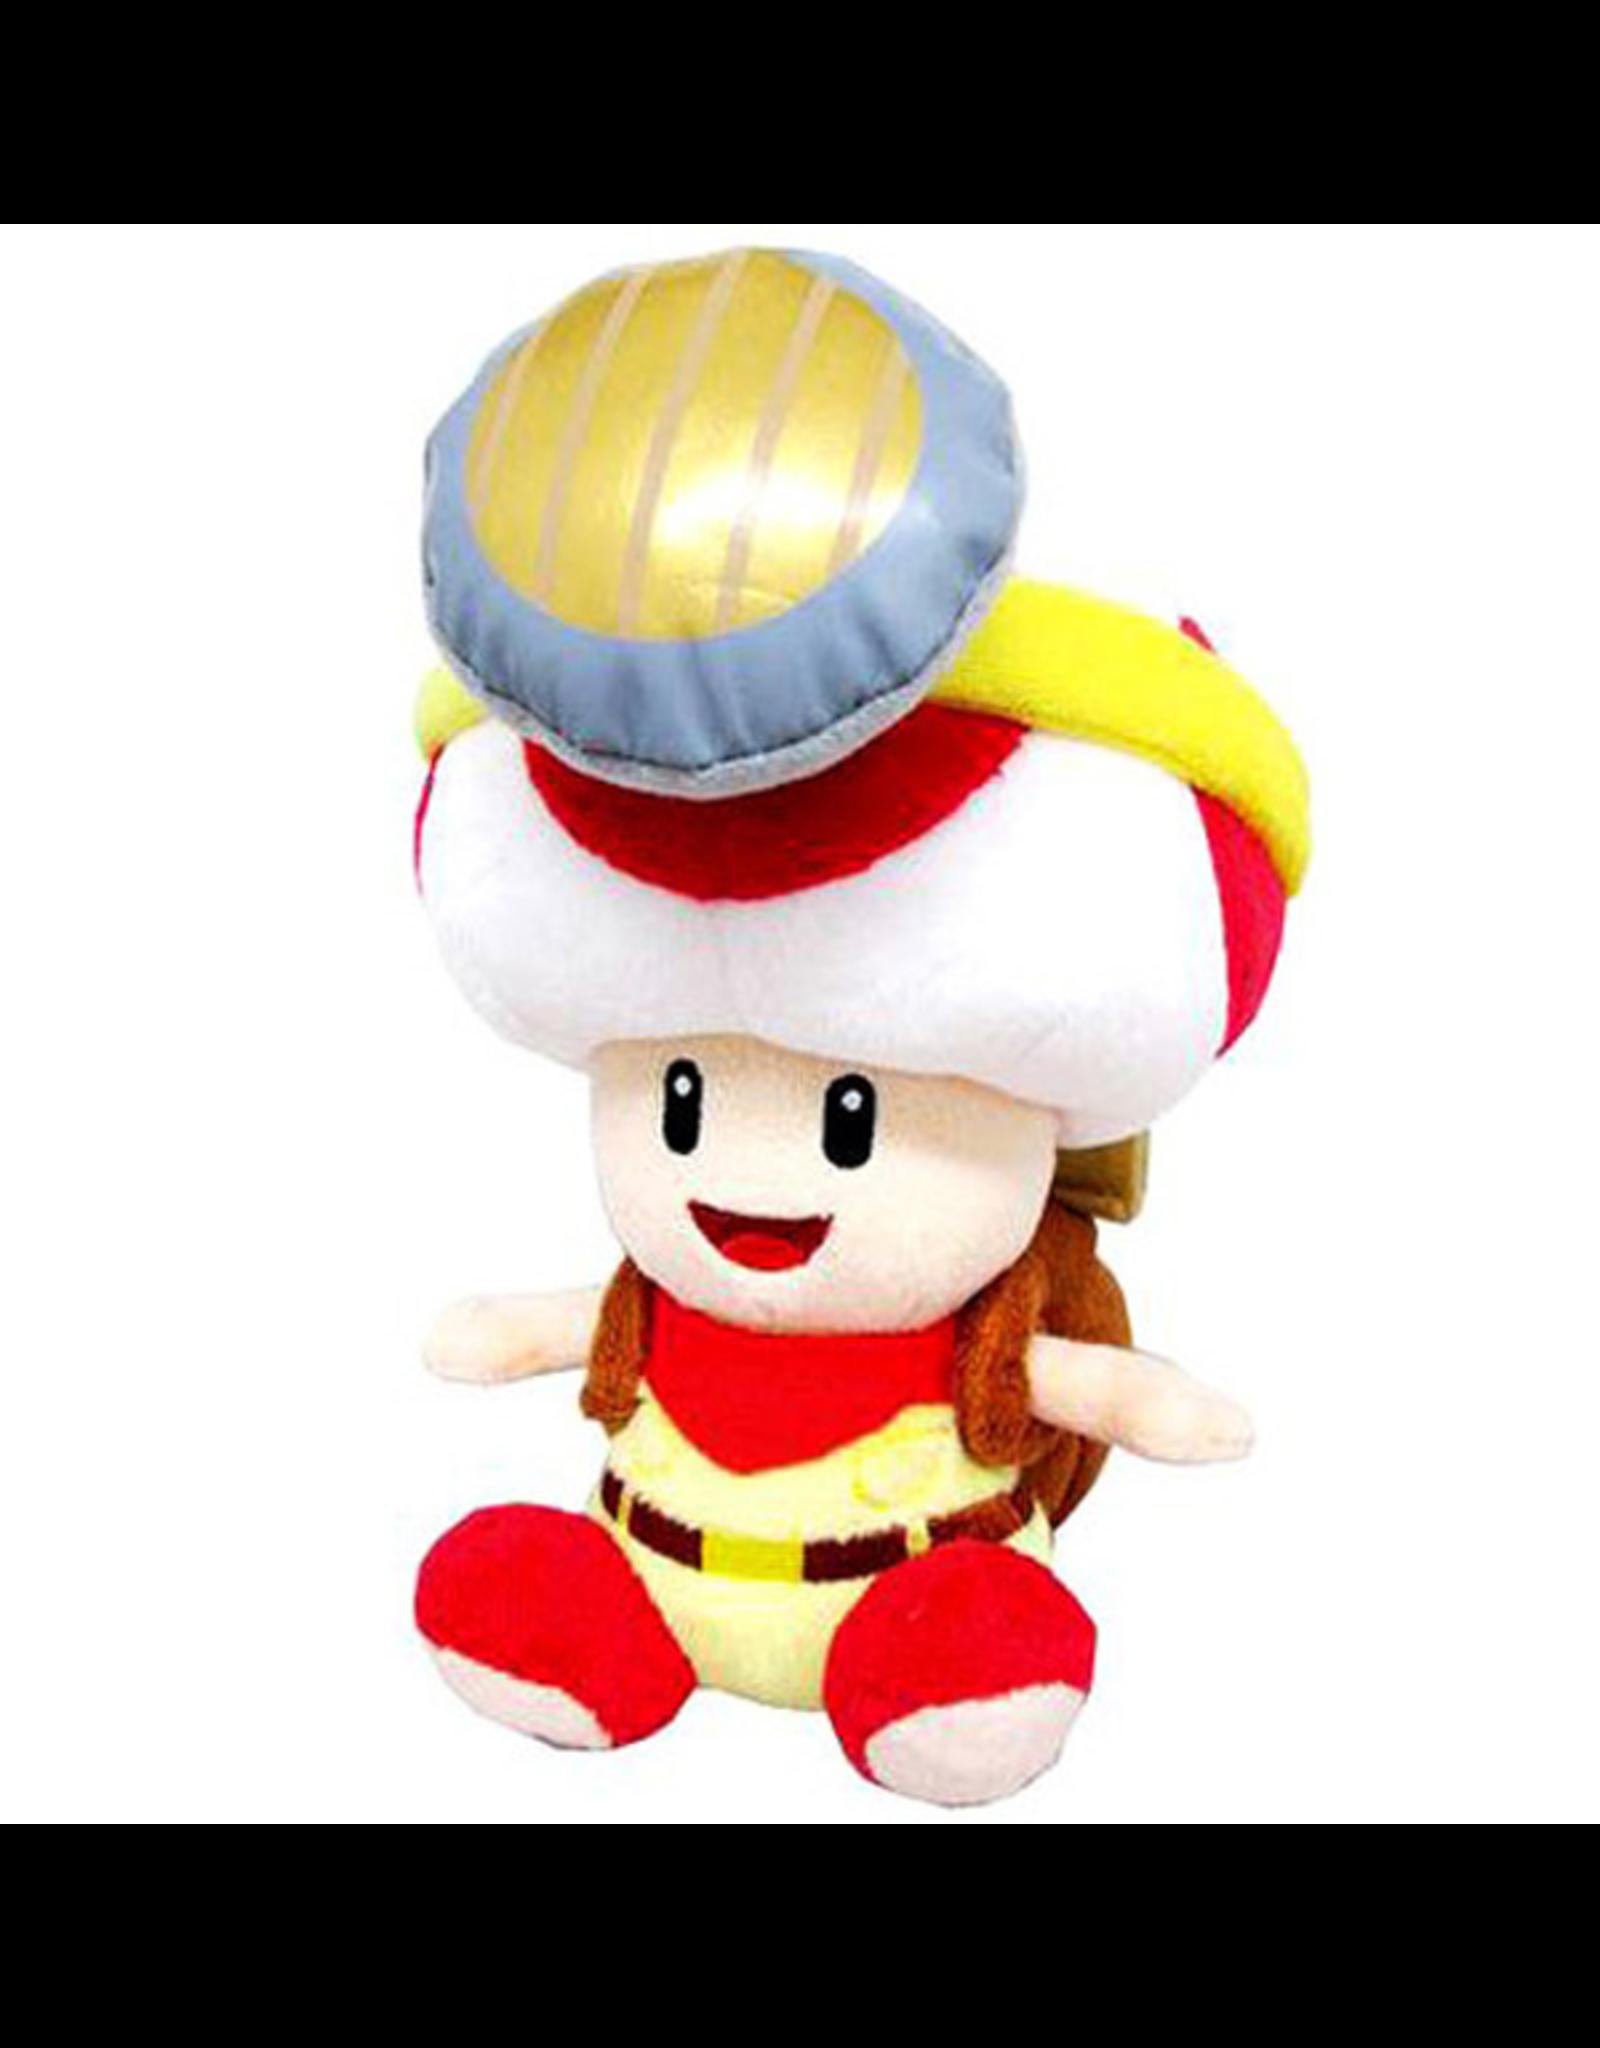 "Little Buddy Little Buddy - Super Mario Bros - Captain Toad (Sitting) - 7"" Plush"